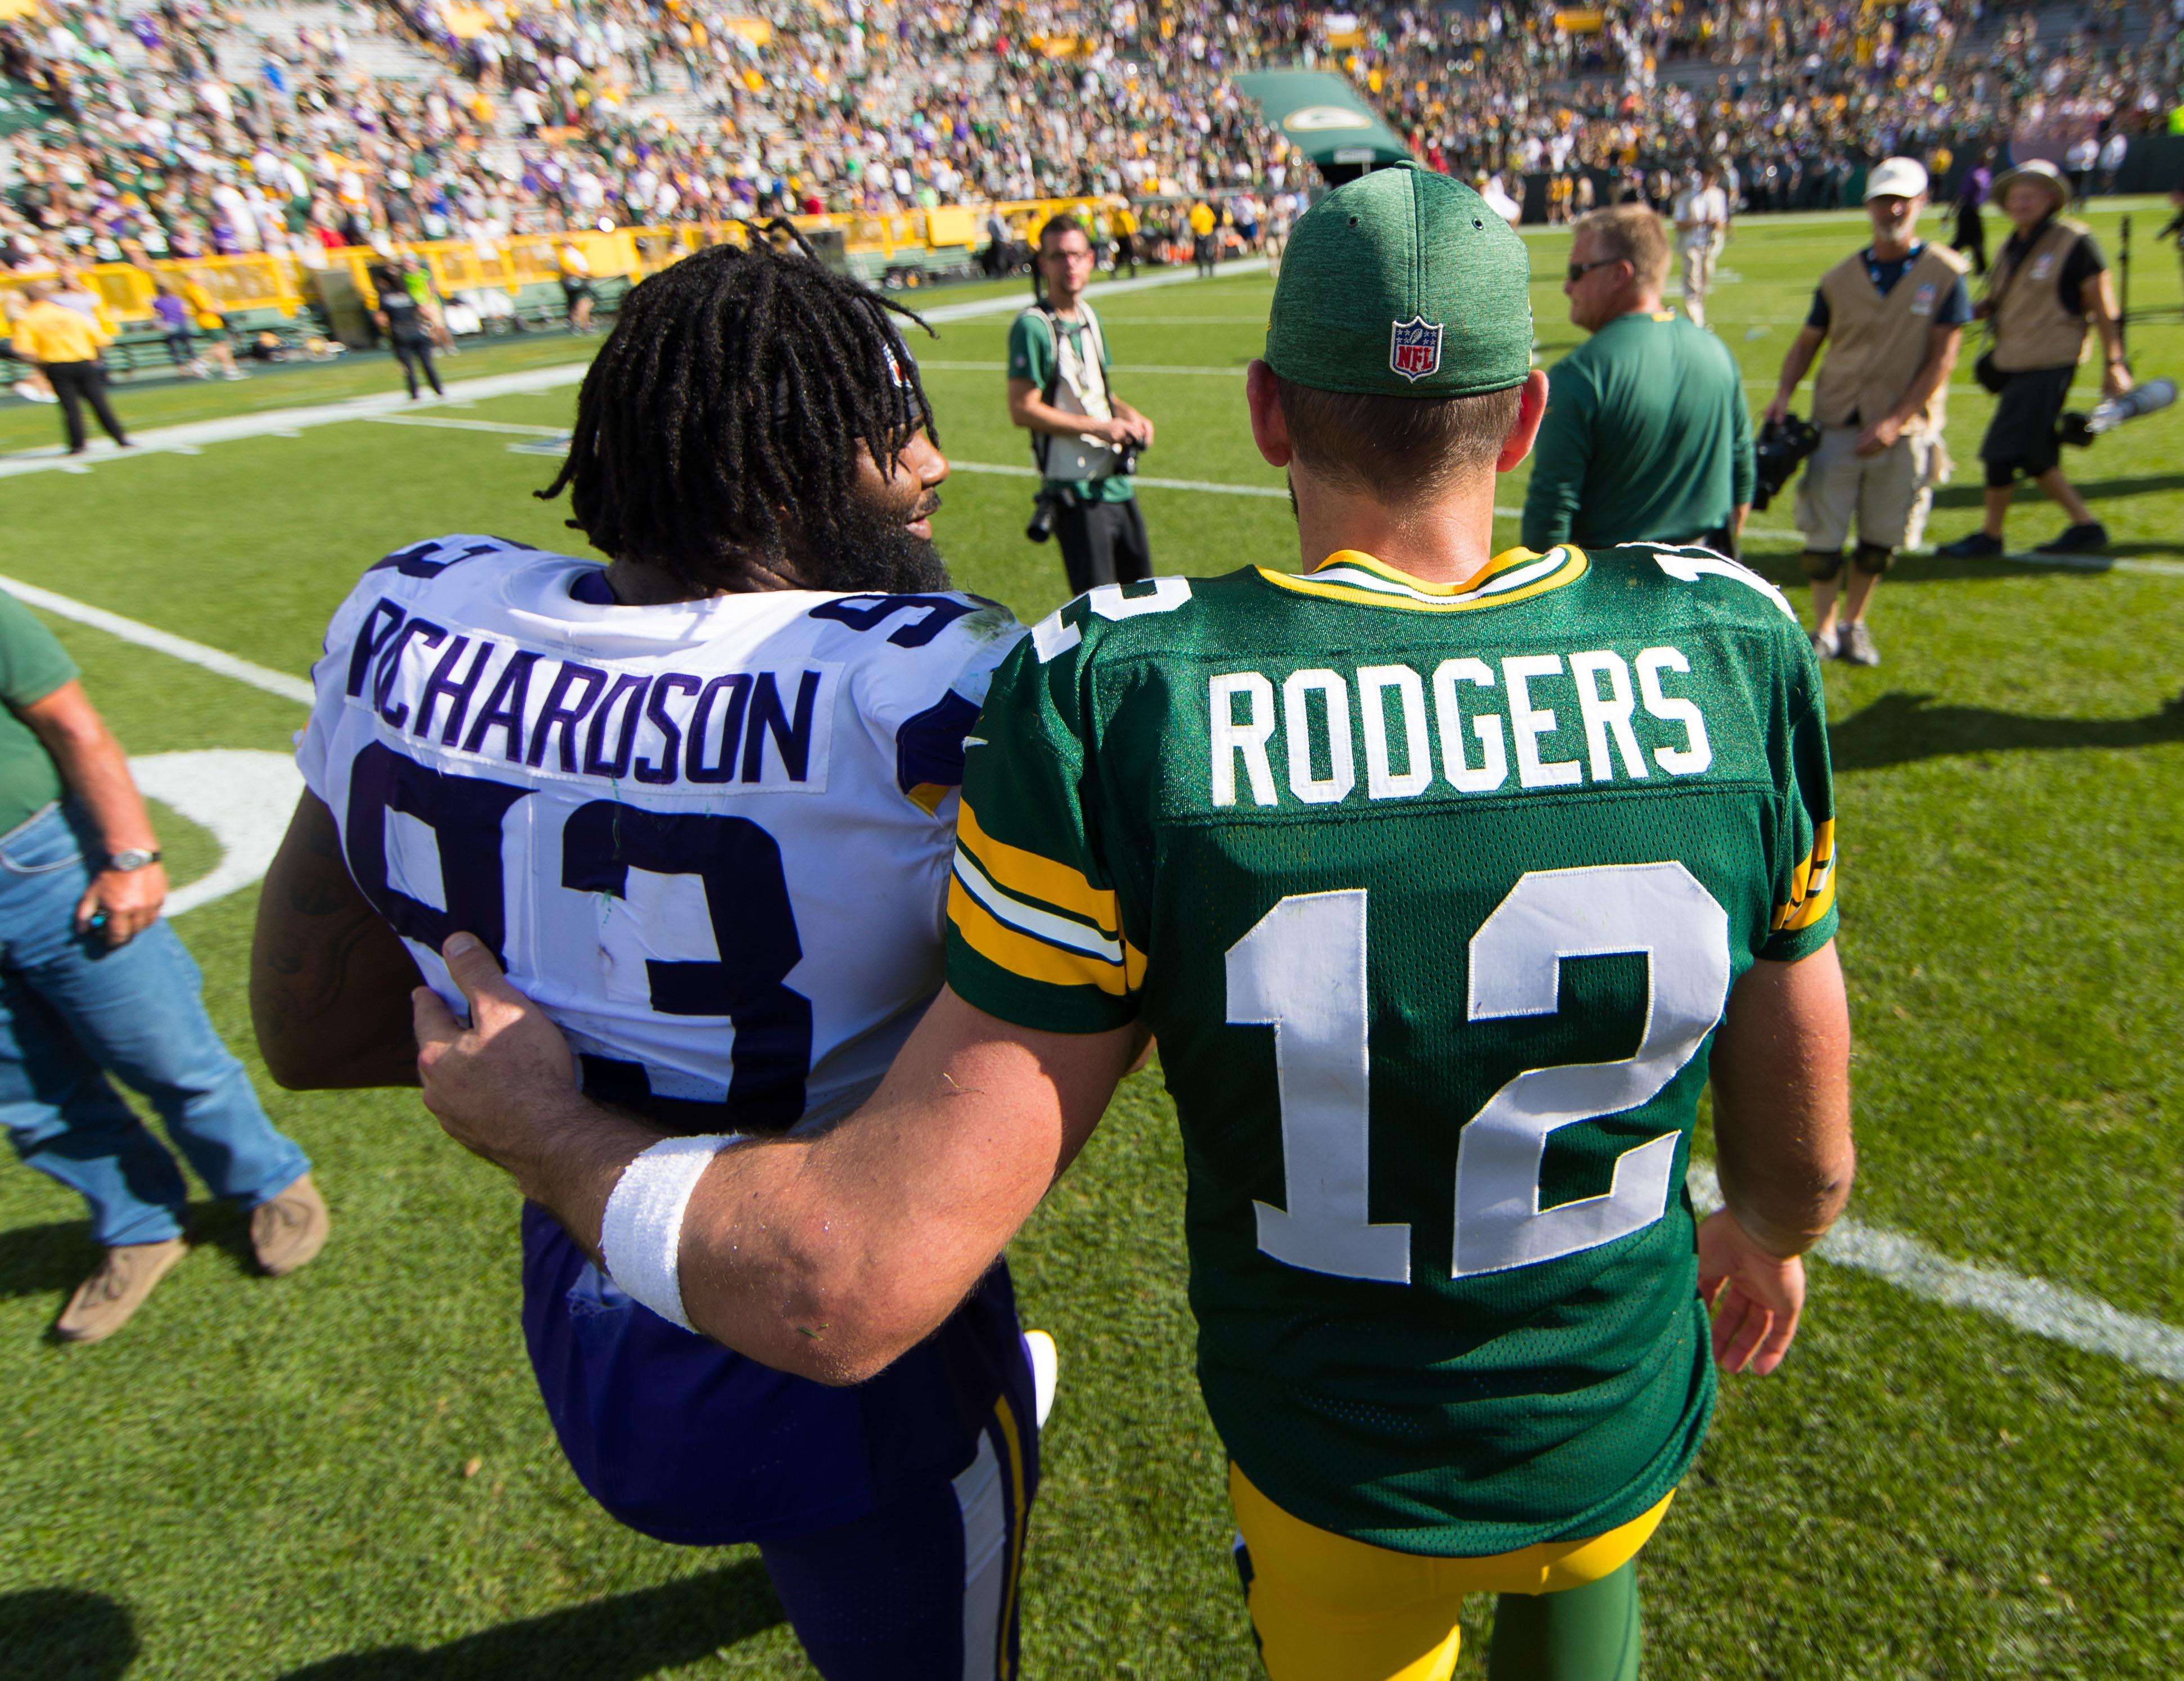 NFL: Minnesota Vikings at Green Bay Packers